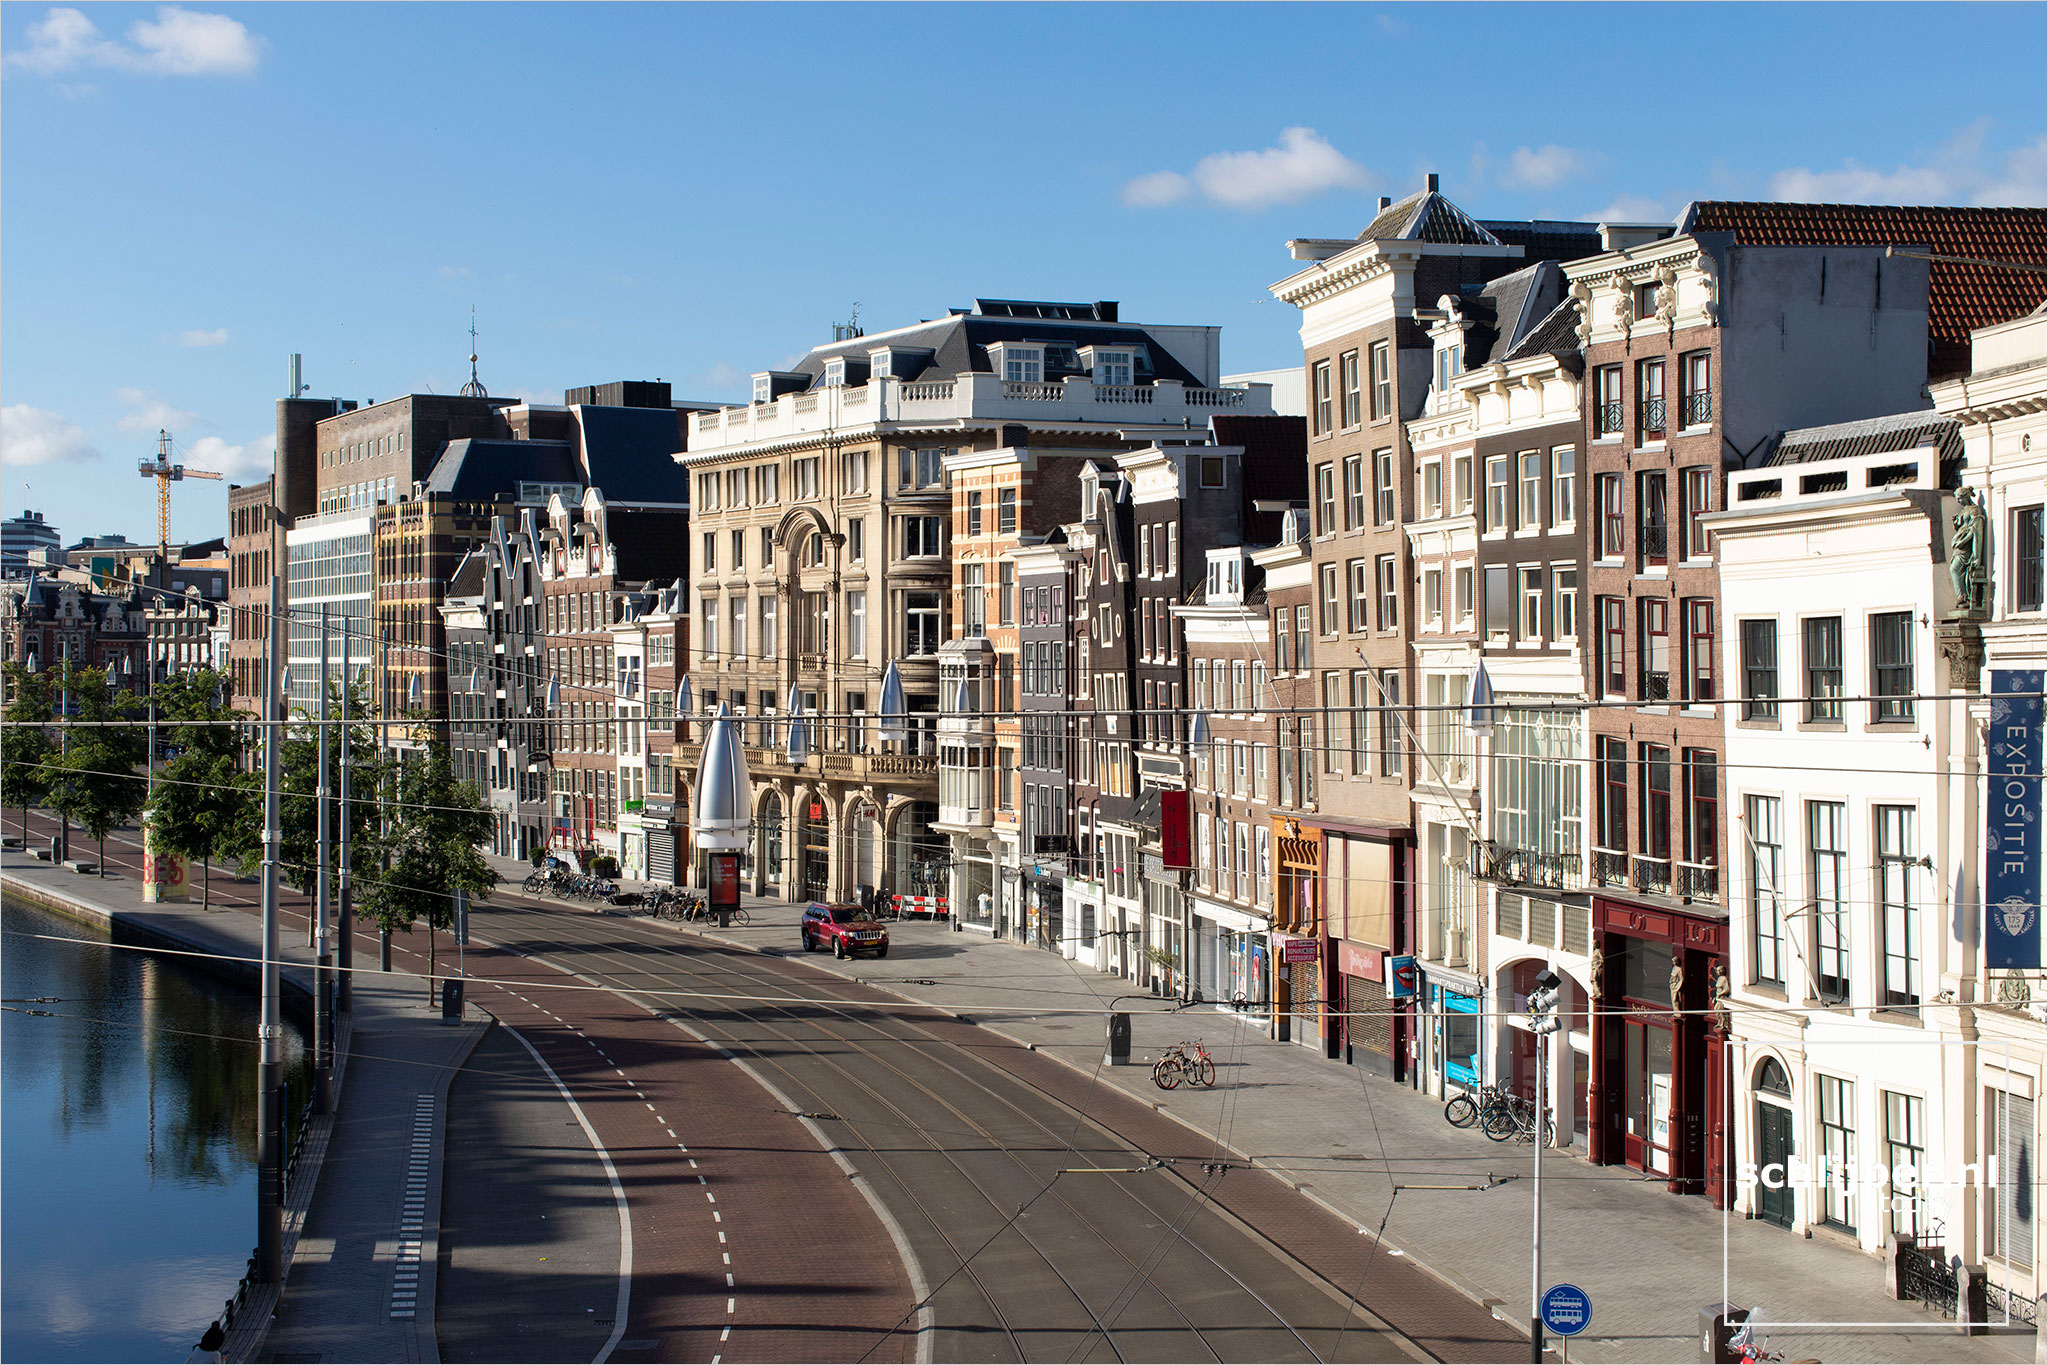 Nederland, Amsterdam, 12 juli 2020